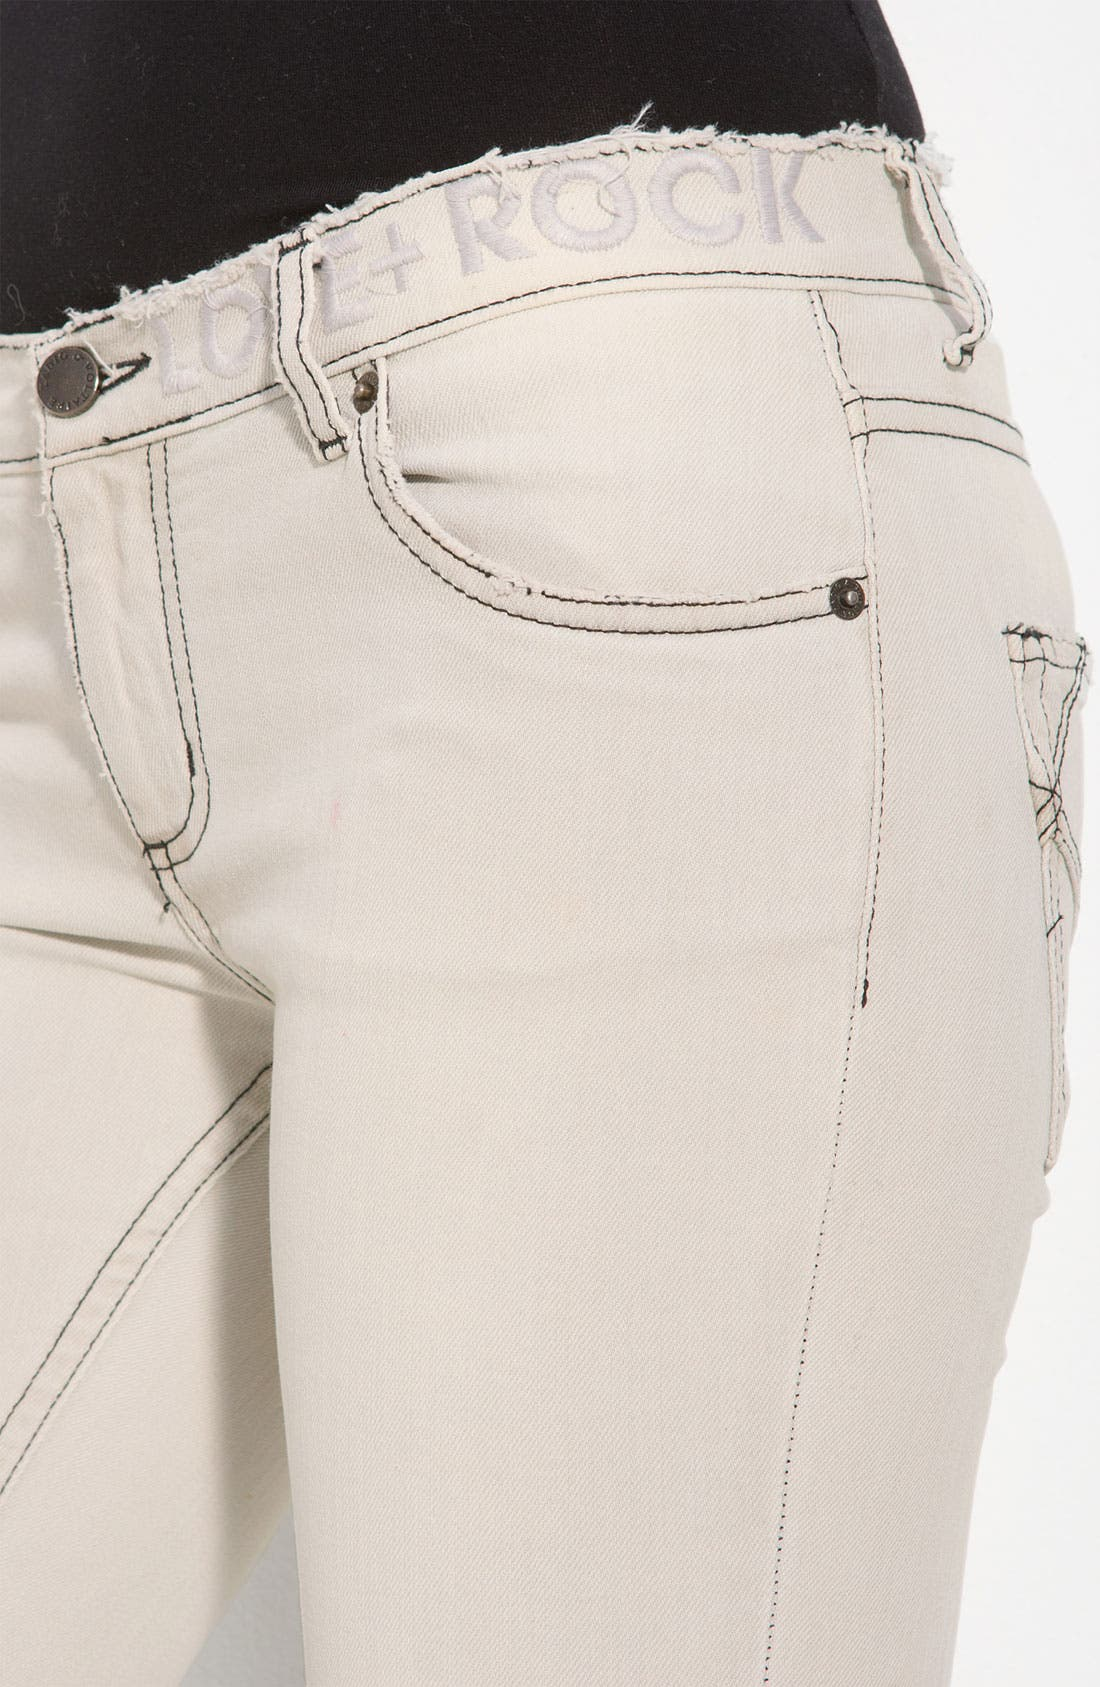 'Darkside' Bleached Skinny Jeans,                             Alternate thumbnail 3, color,                             Blanc